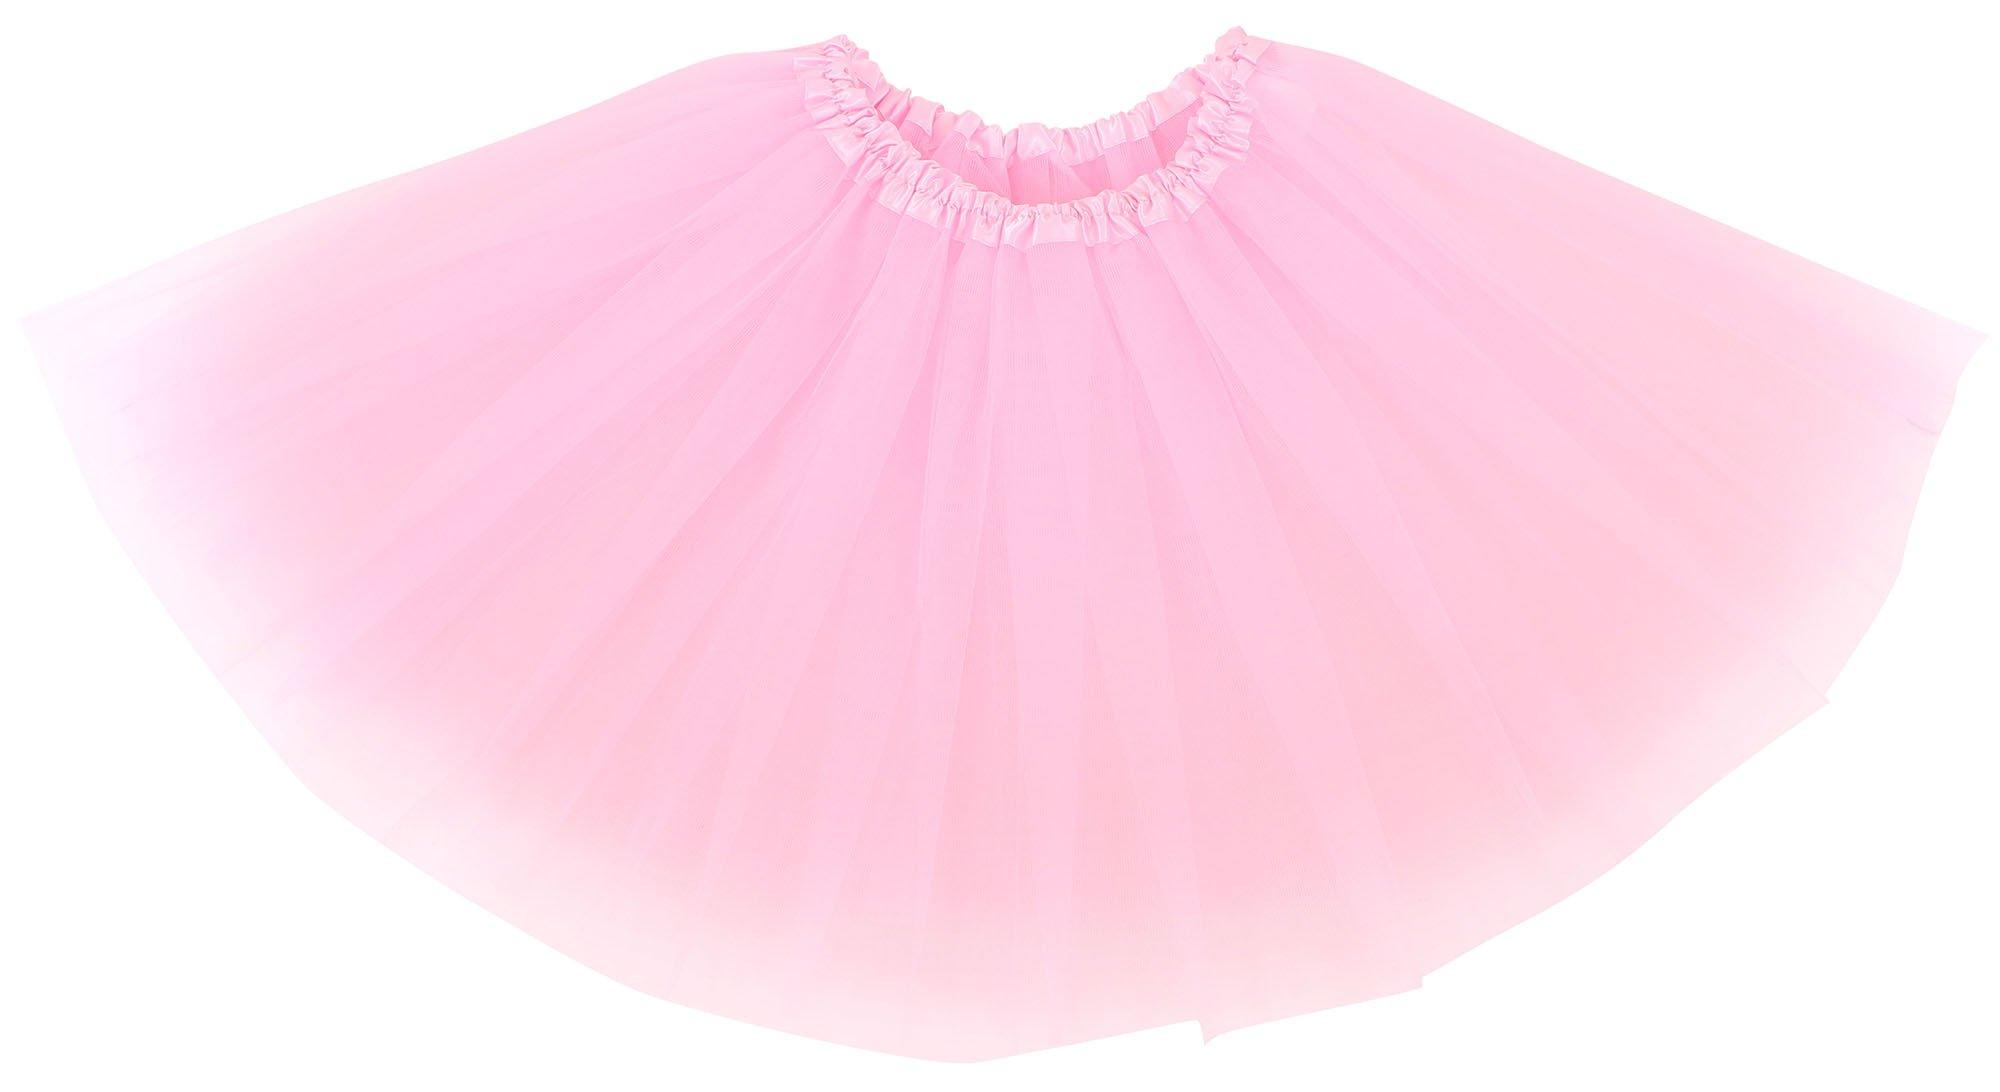 Simplicity Women's Classic Elastic, 3-Layered Tulle Tutu Skirt, Pink